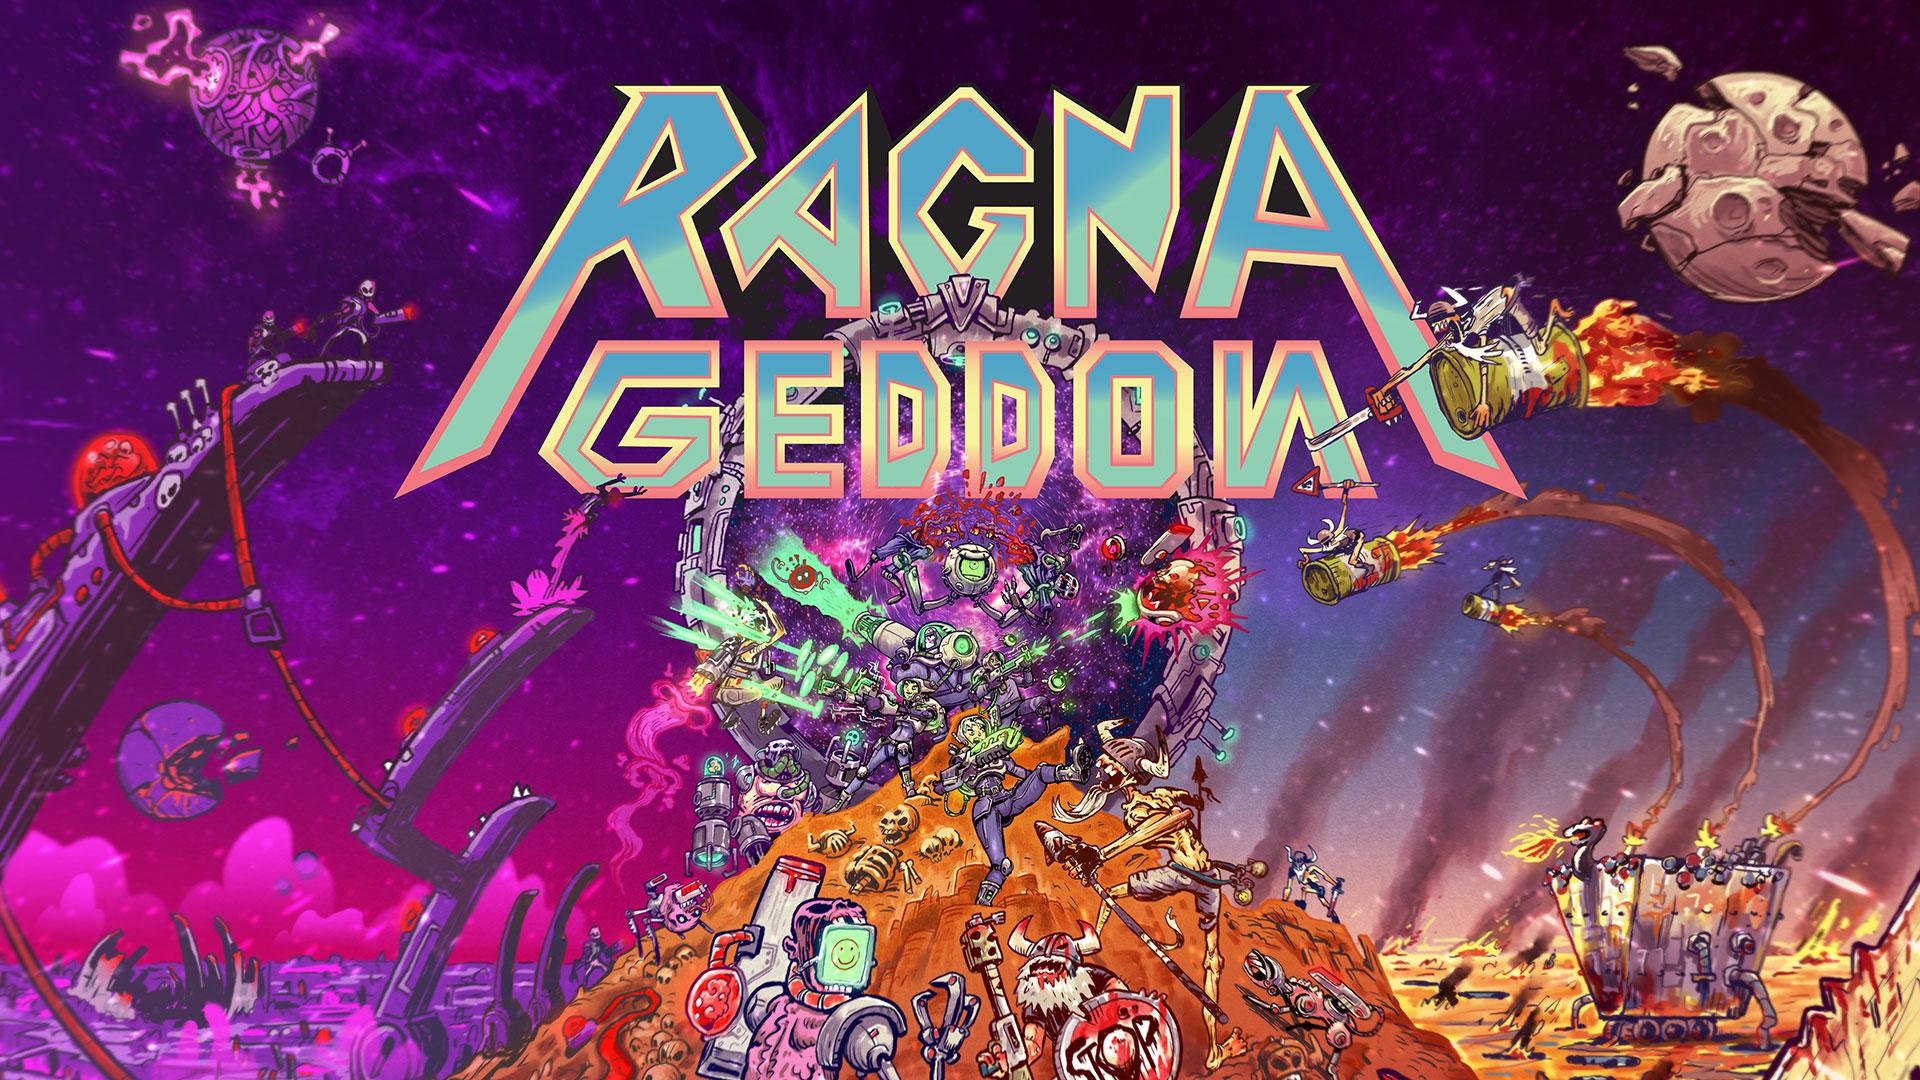 Ragnageddon